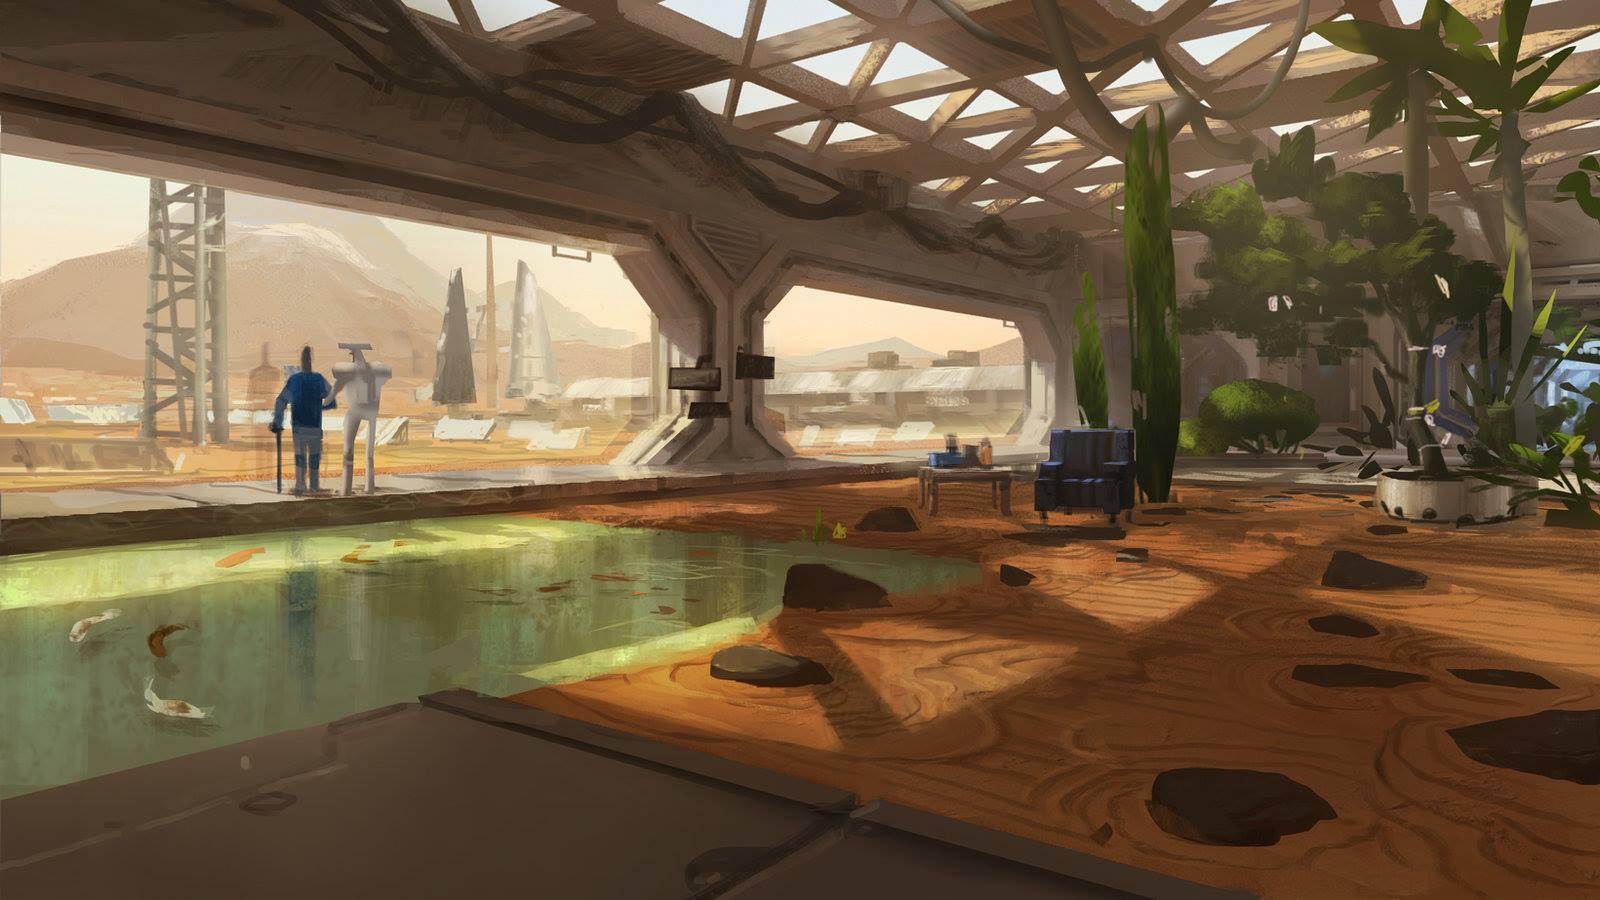 human Mars: Mars station garden by Aka Kuro